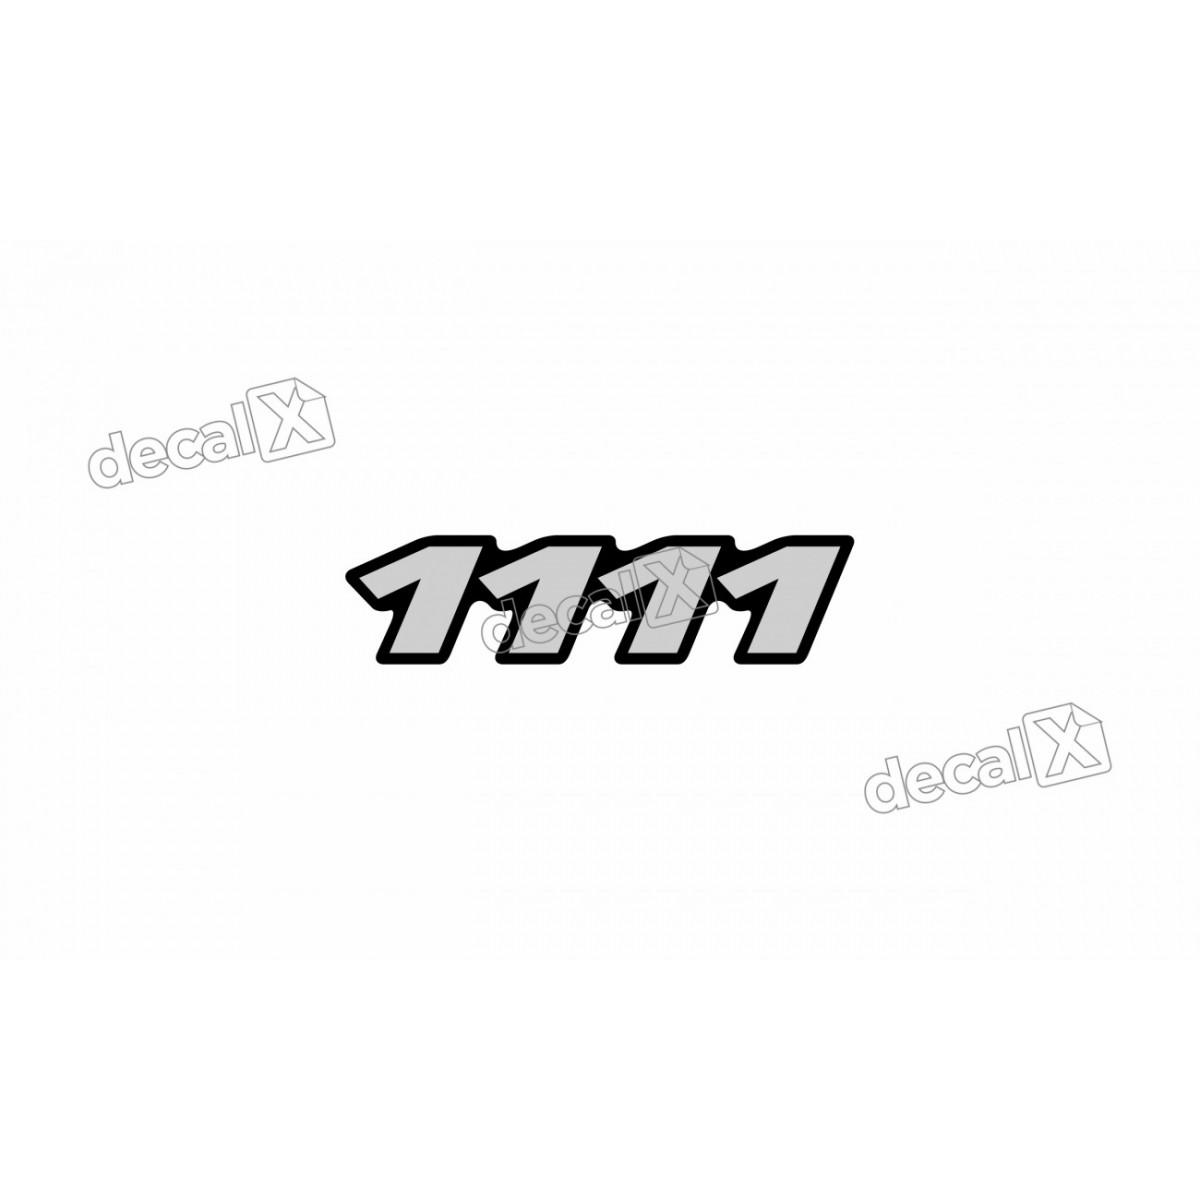 Adesivo Emblema Resinado Mercedes 1111 Cm15 Decalx